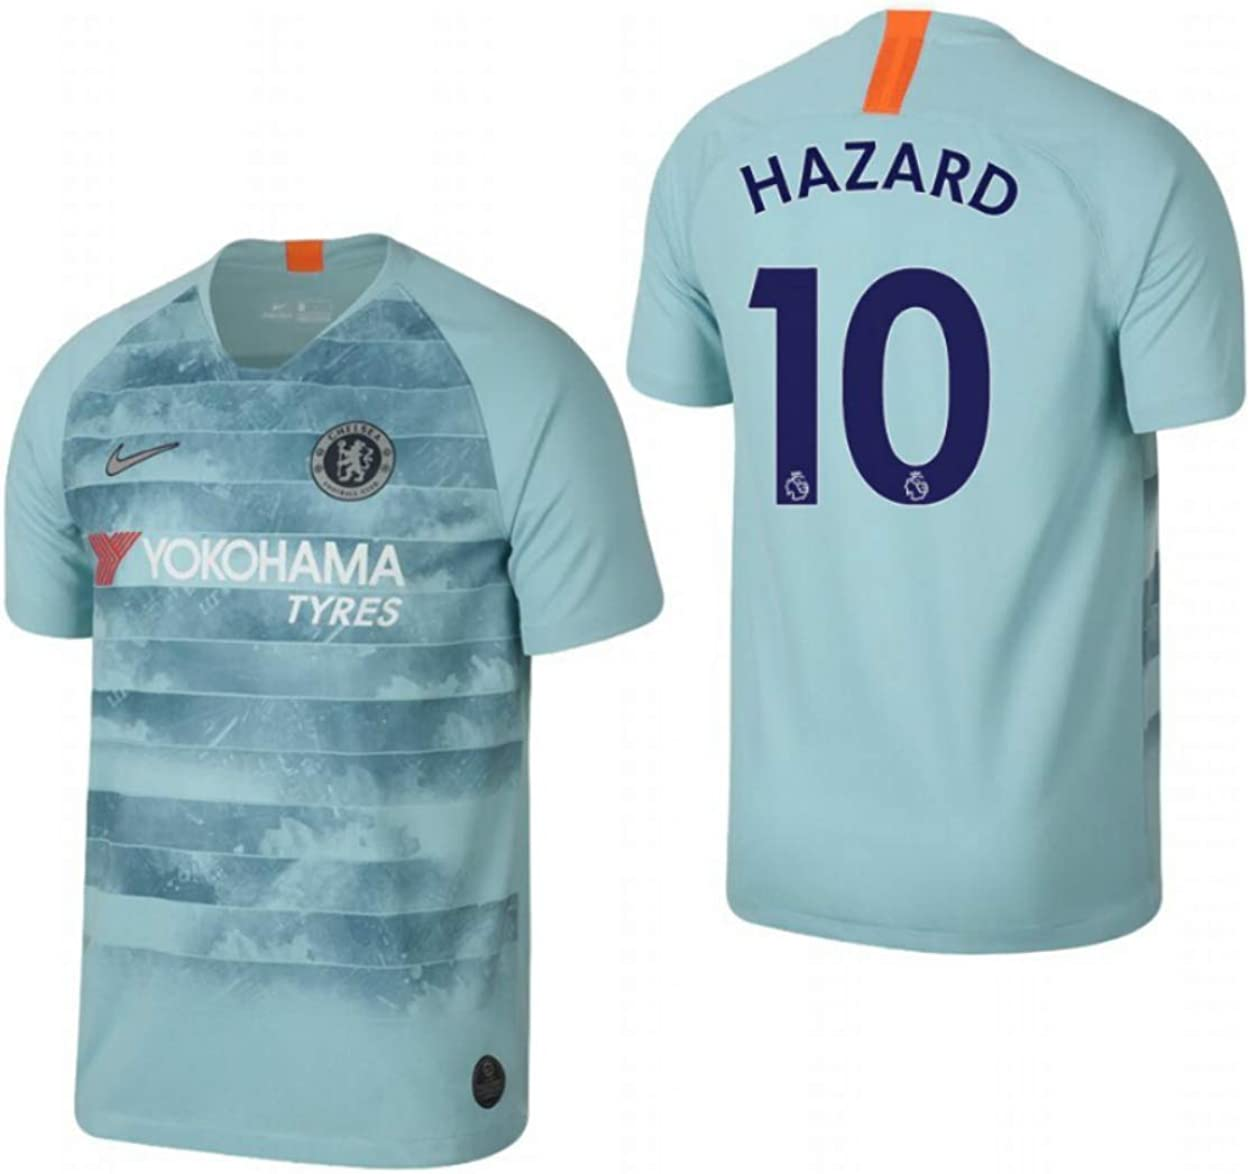 ProApparels Hazard Jersey Chelsea Third 2018/2019 (Official Jersey & Printing) (XL)